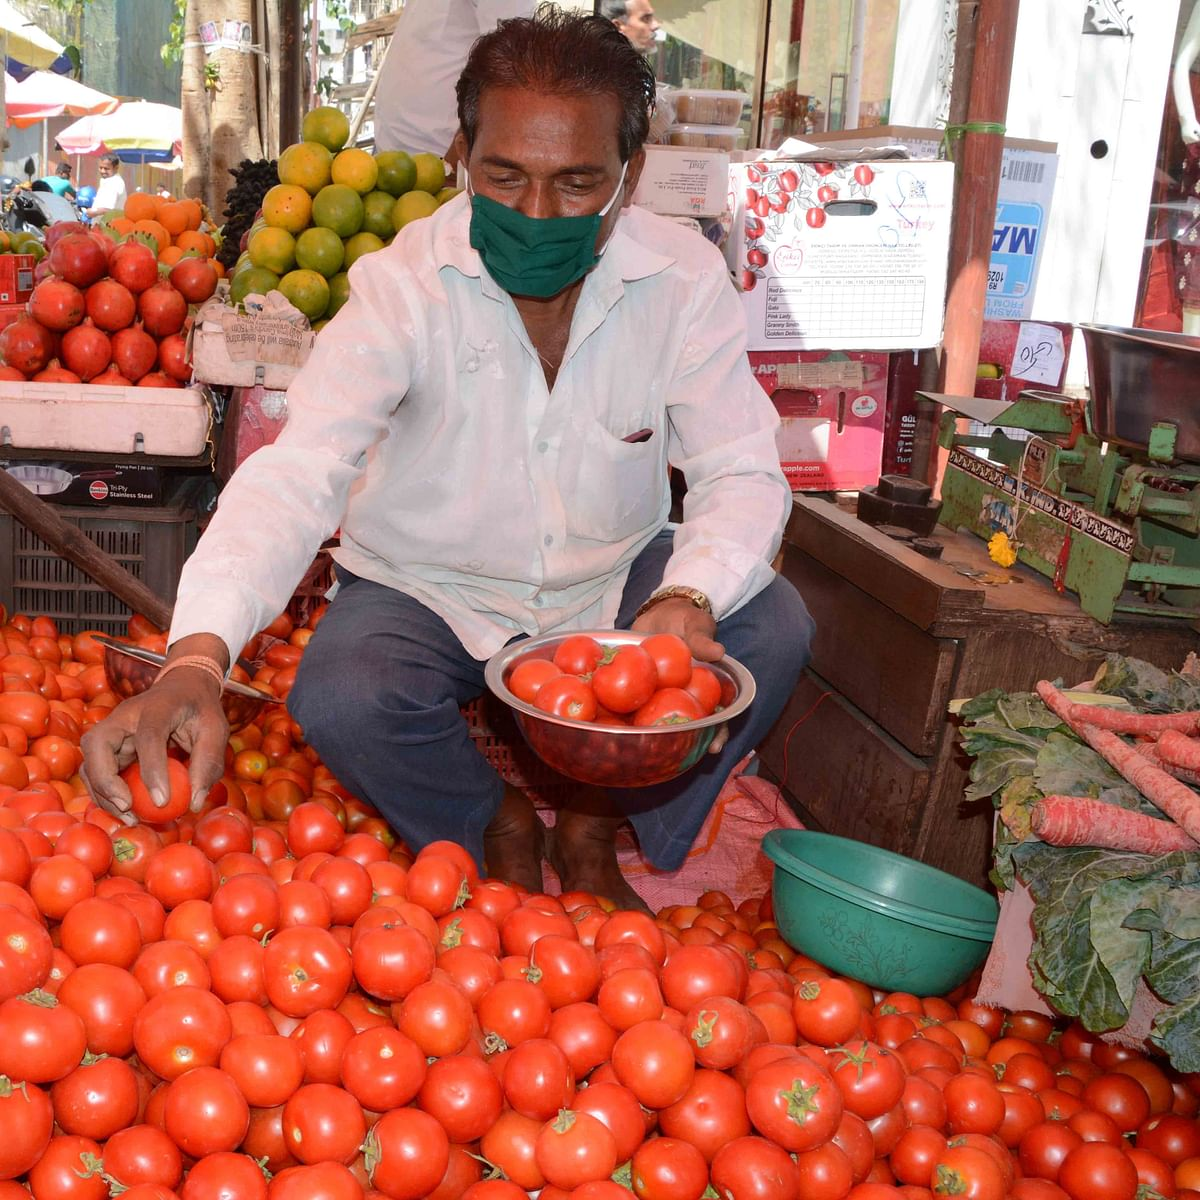 Coronavirus in Mumbai: Veggie prices soar as supplies plunge due to nationwide lockdown